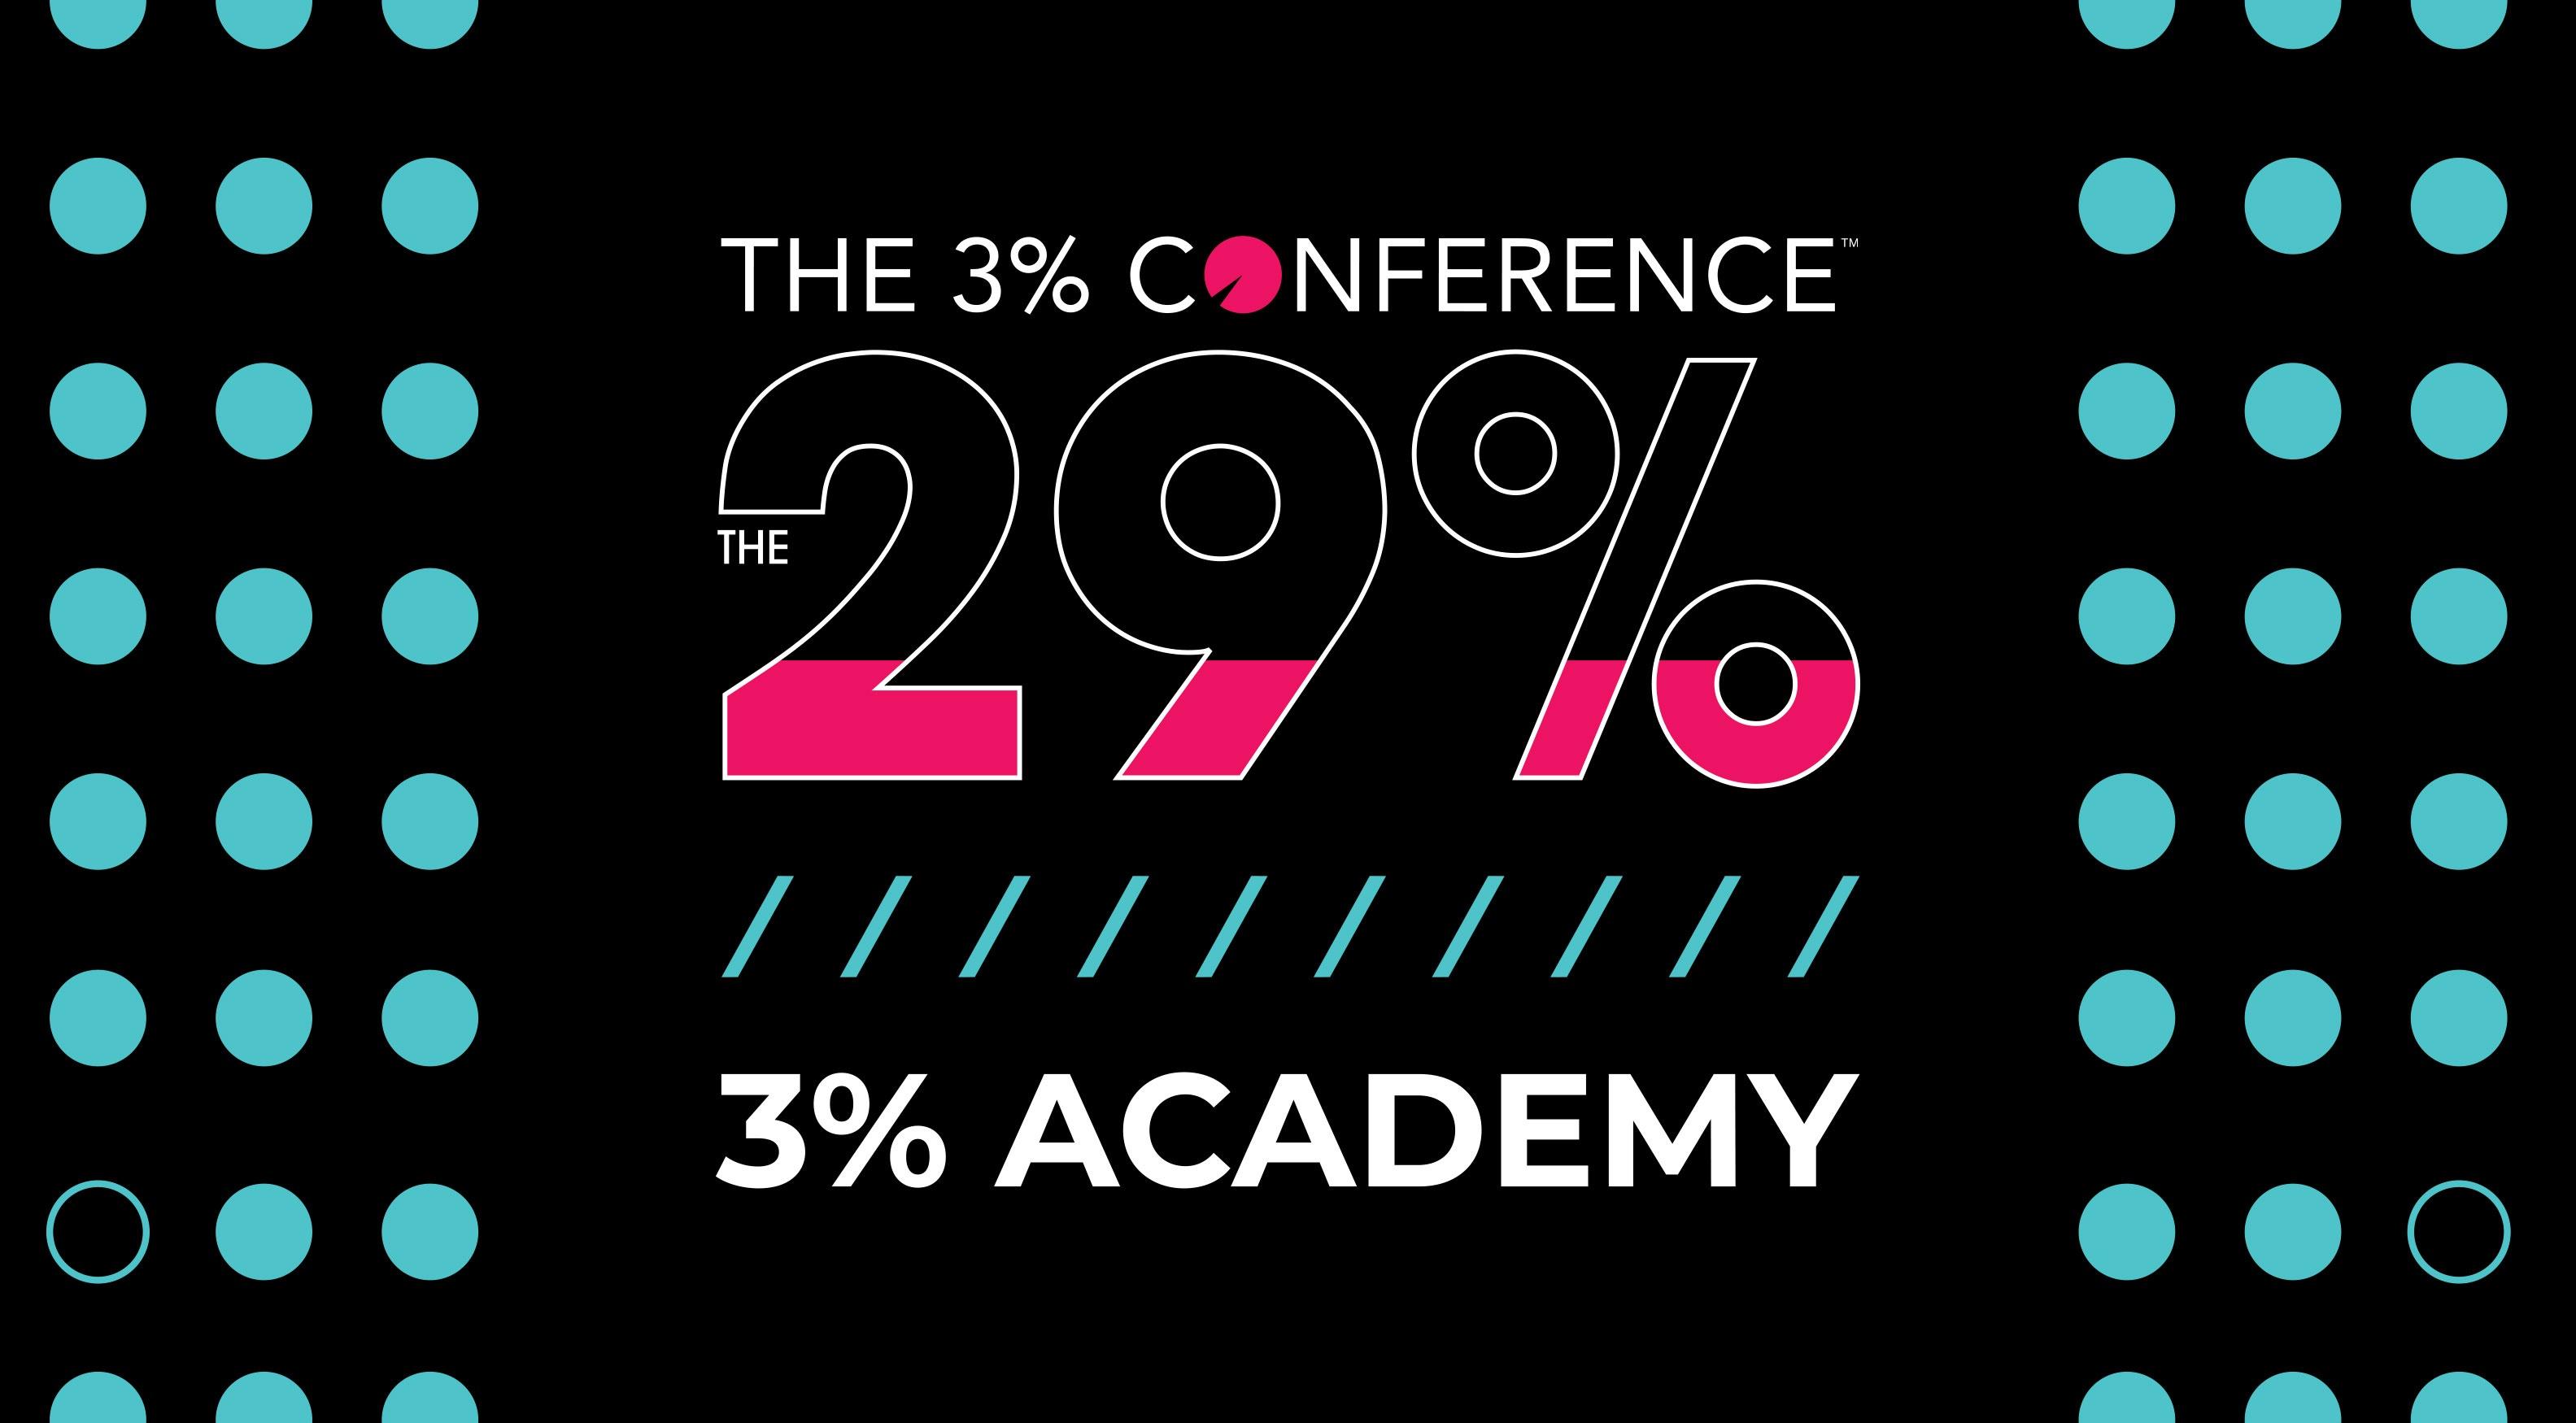 3% Academy - The 29%  Agency Edition